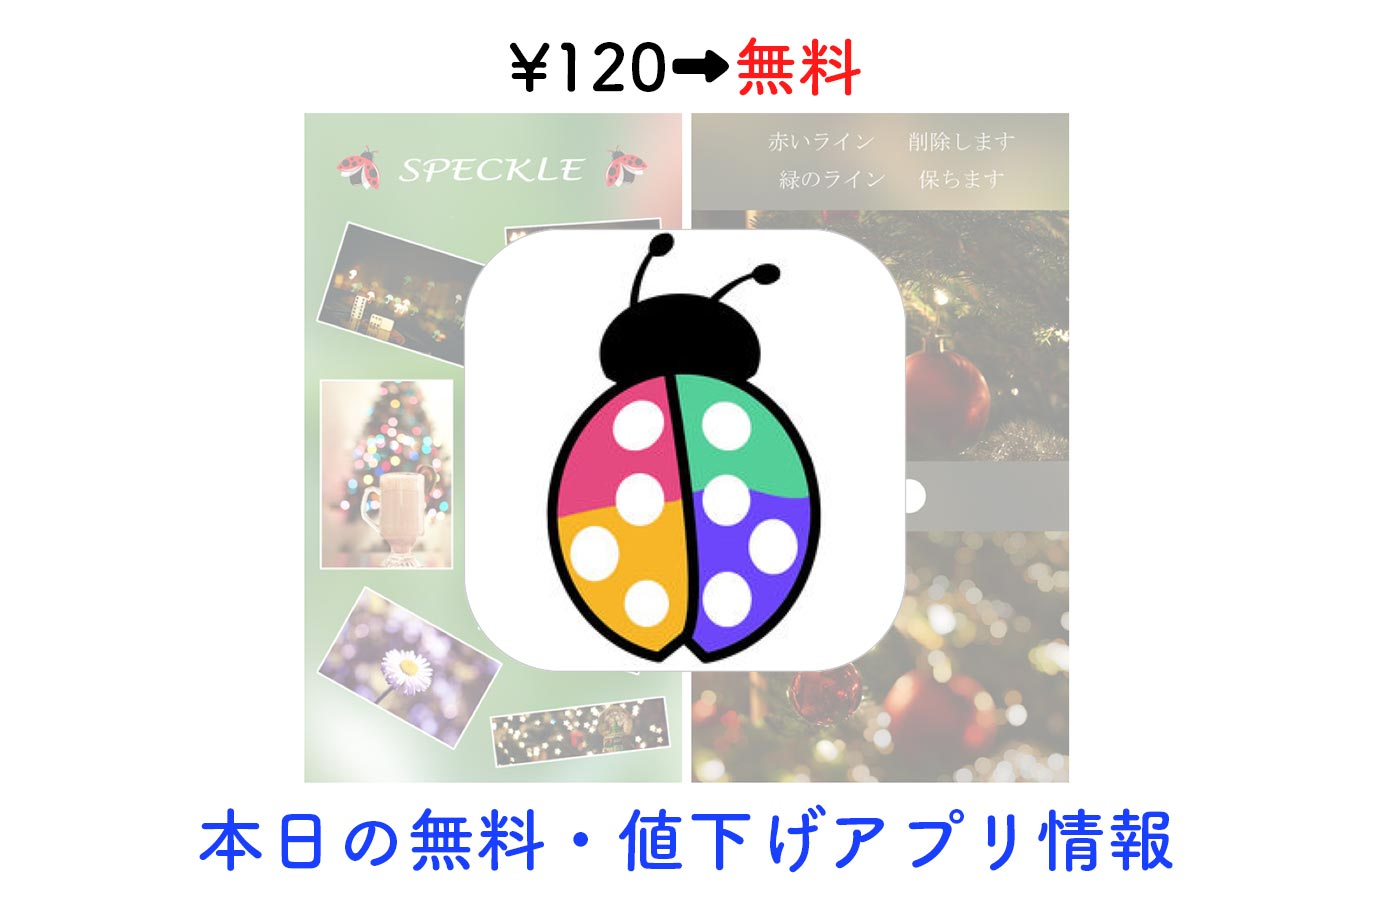 Appsale1119